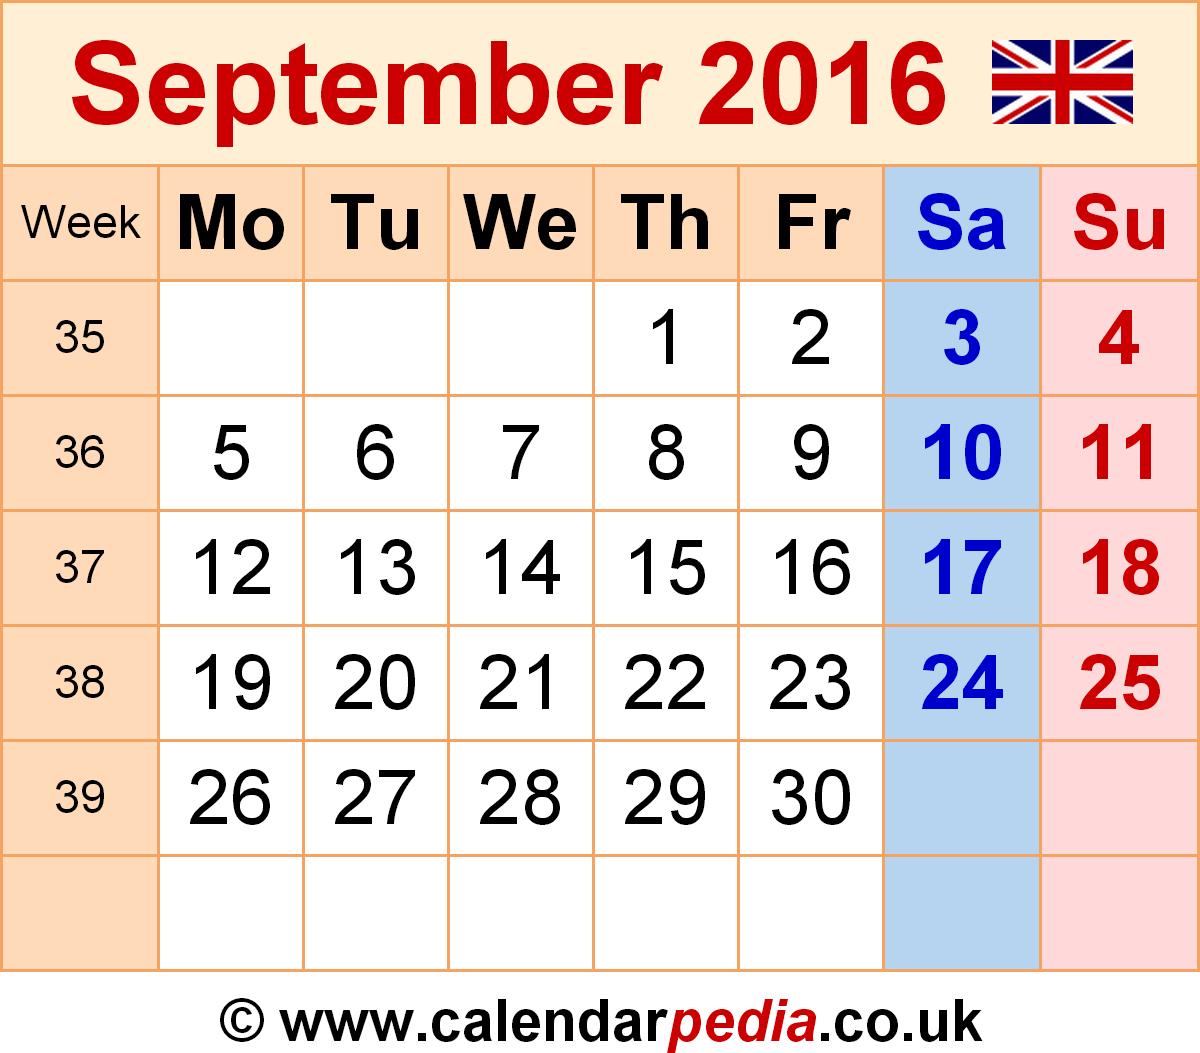 Genial September 2016 Calendar Kalnirnay